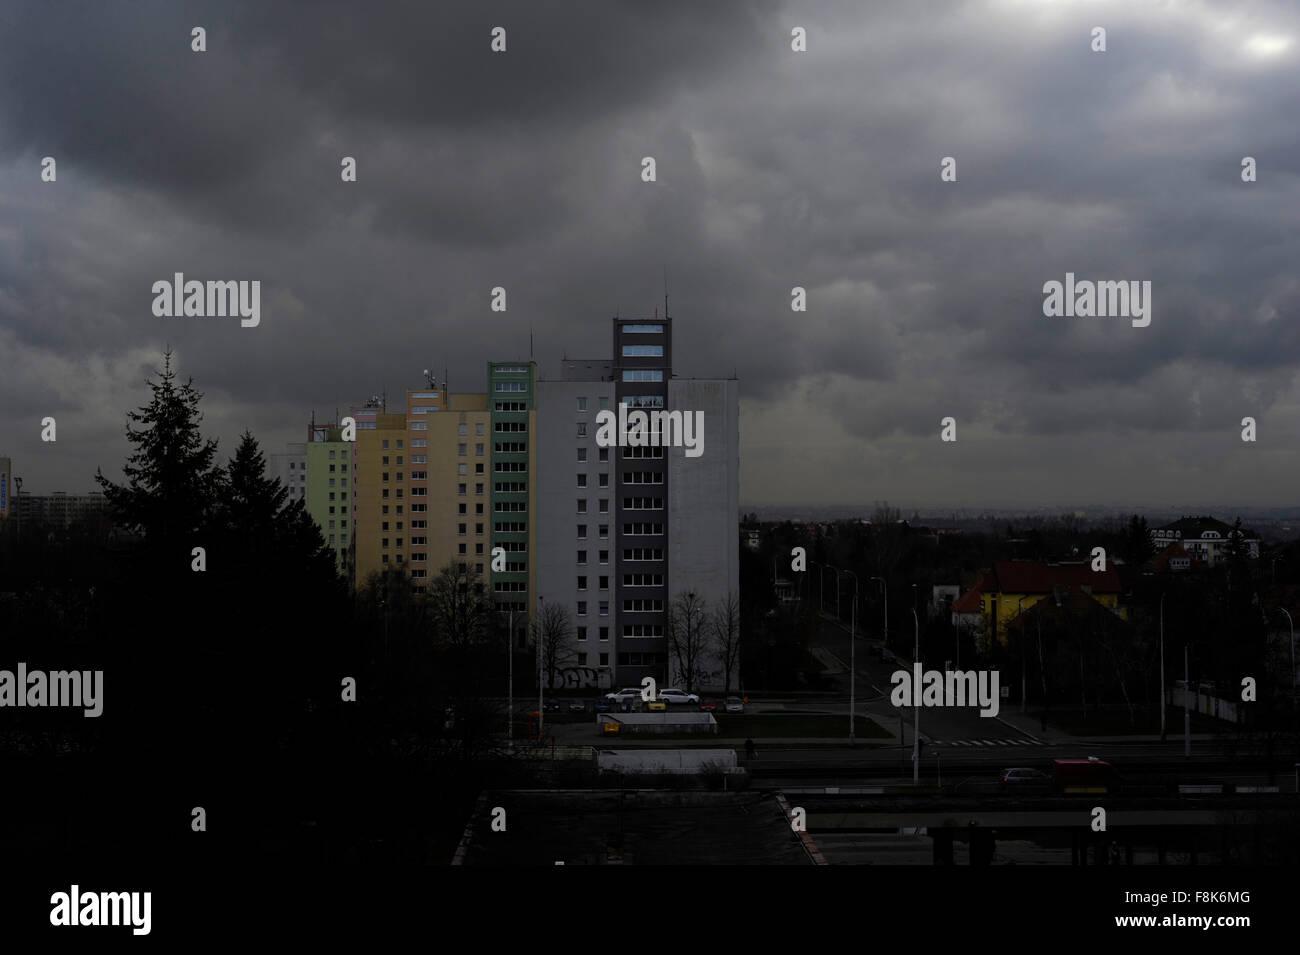 Ex Unión Soviética URSS arquitectura, edificios en bloque. Afueras de Praga República Checa Imagen De Stock